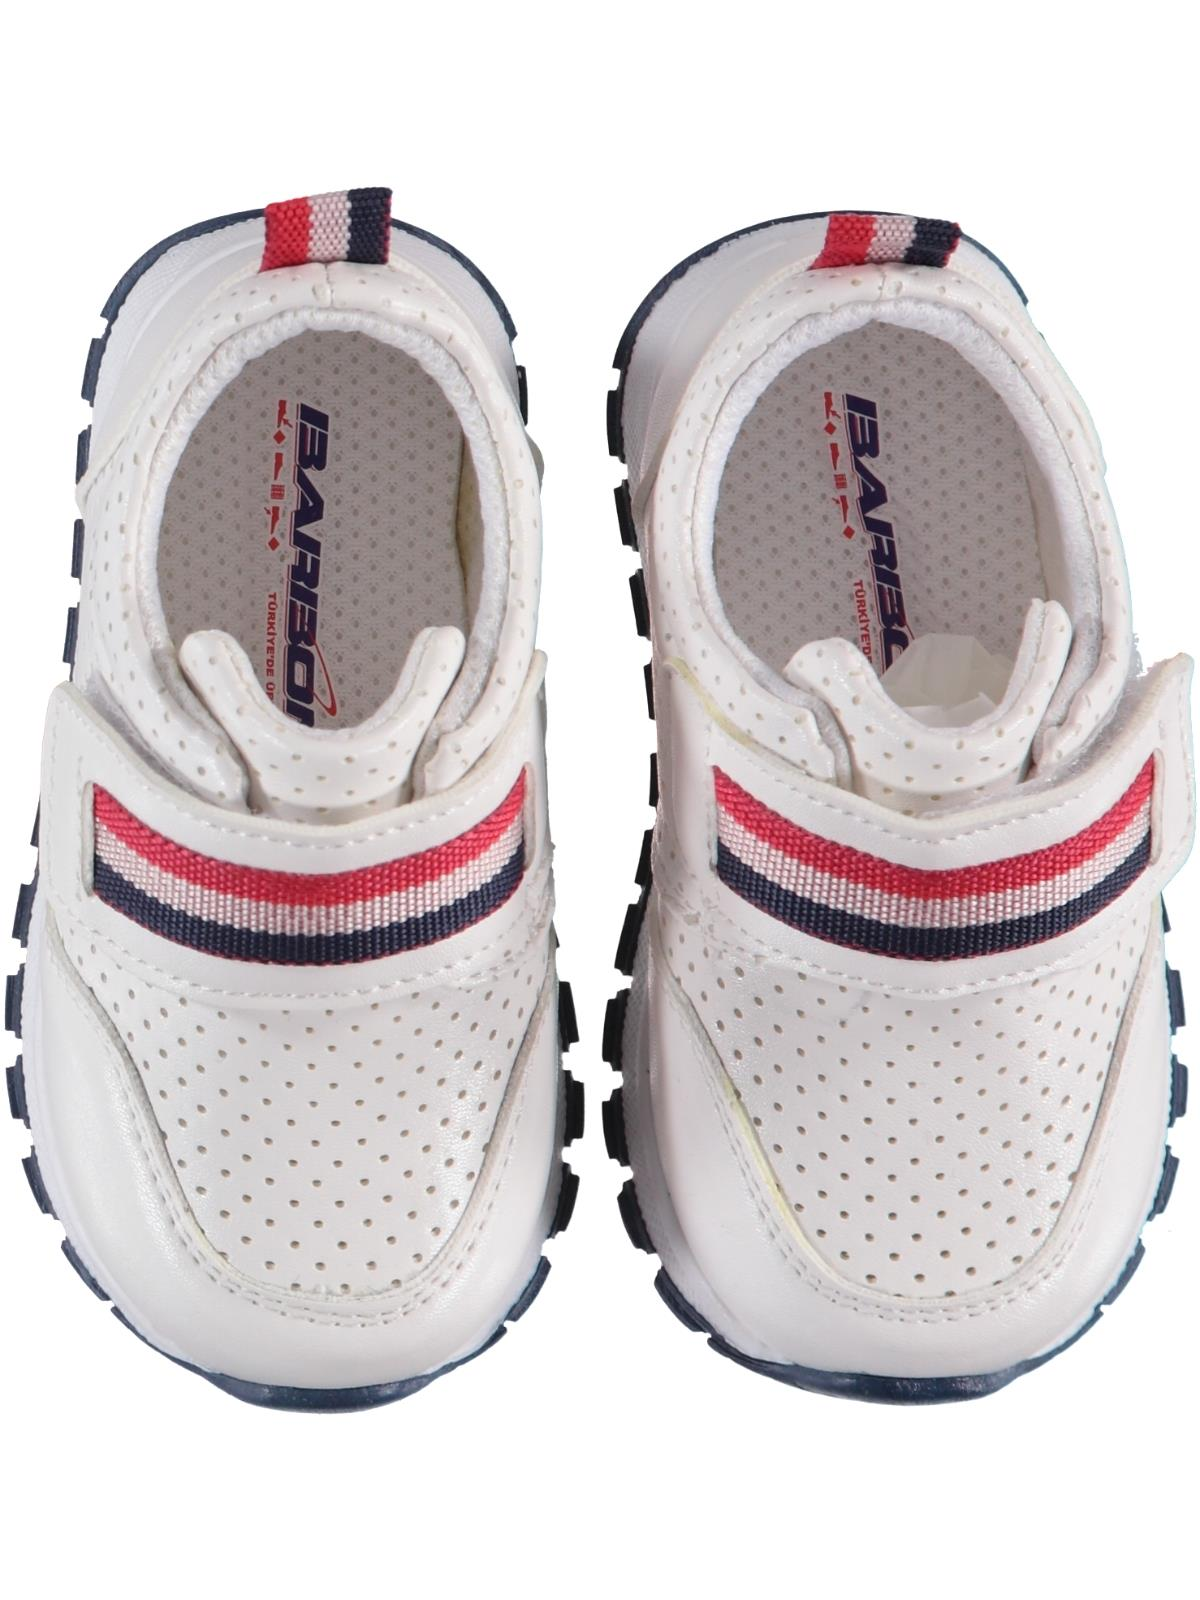 Barbone Baby Boy White Sneakers 21-25 Number